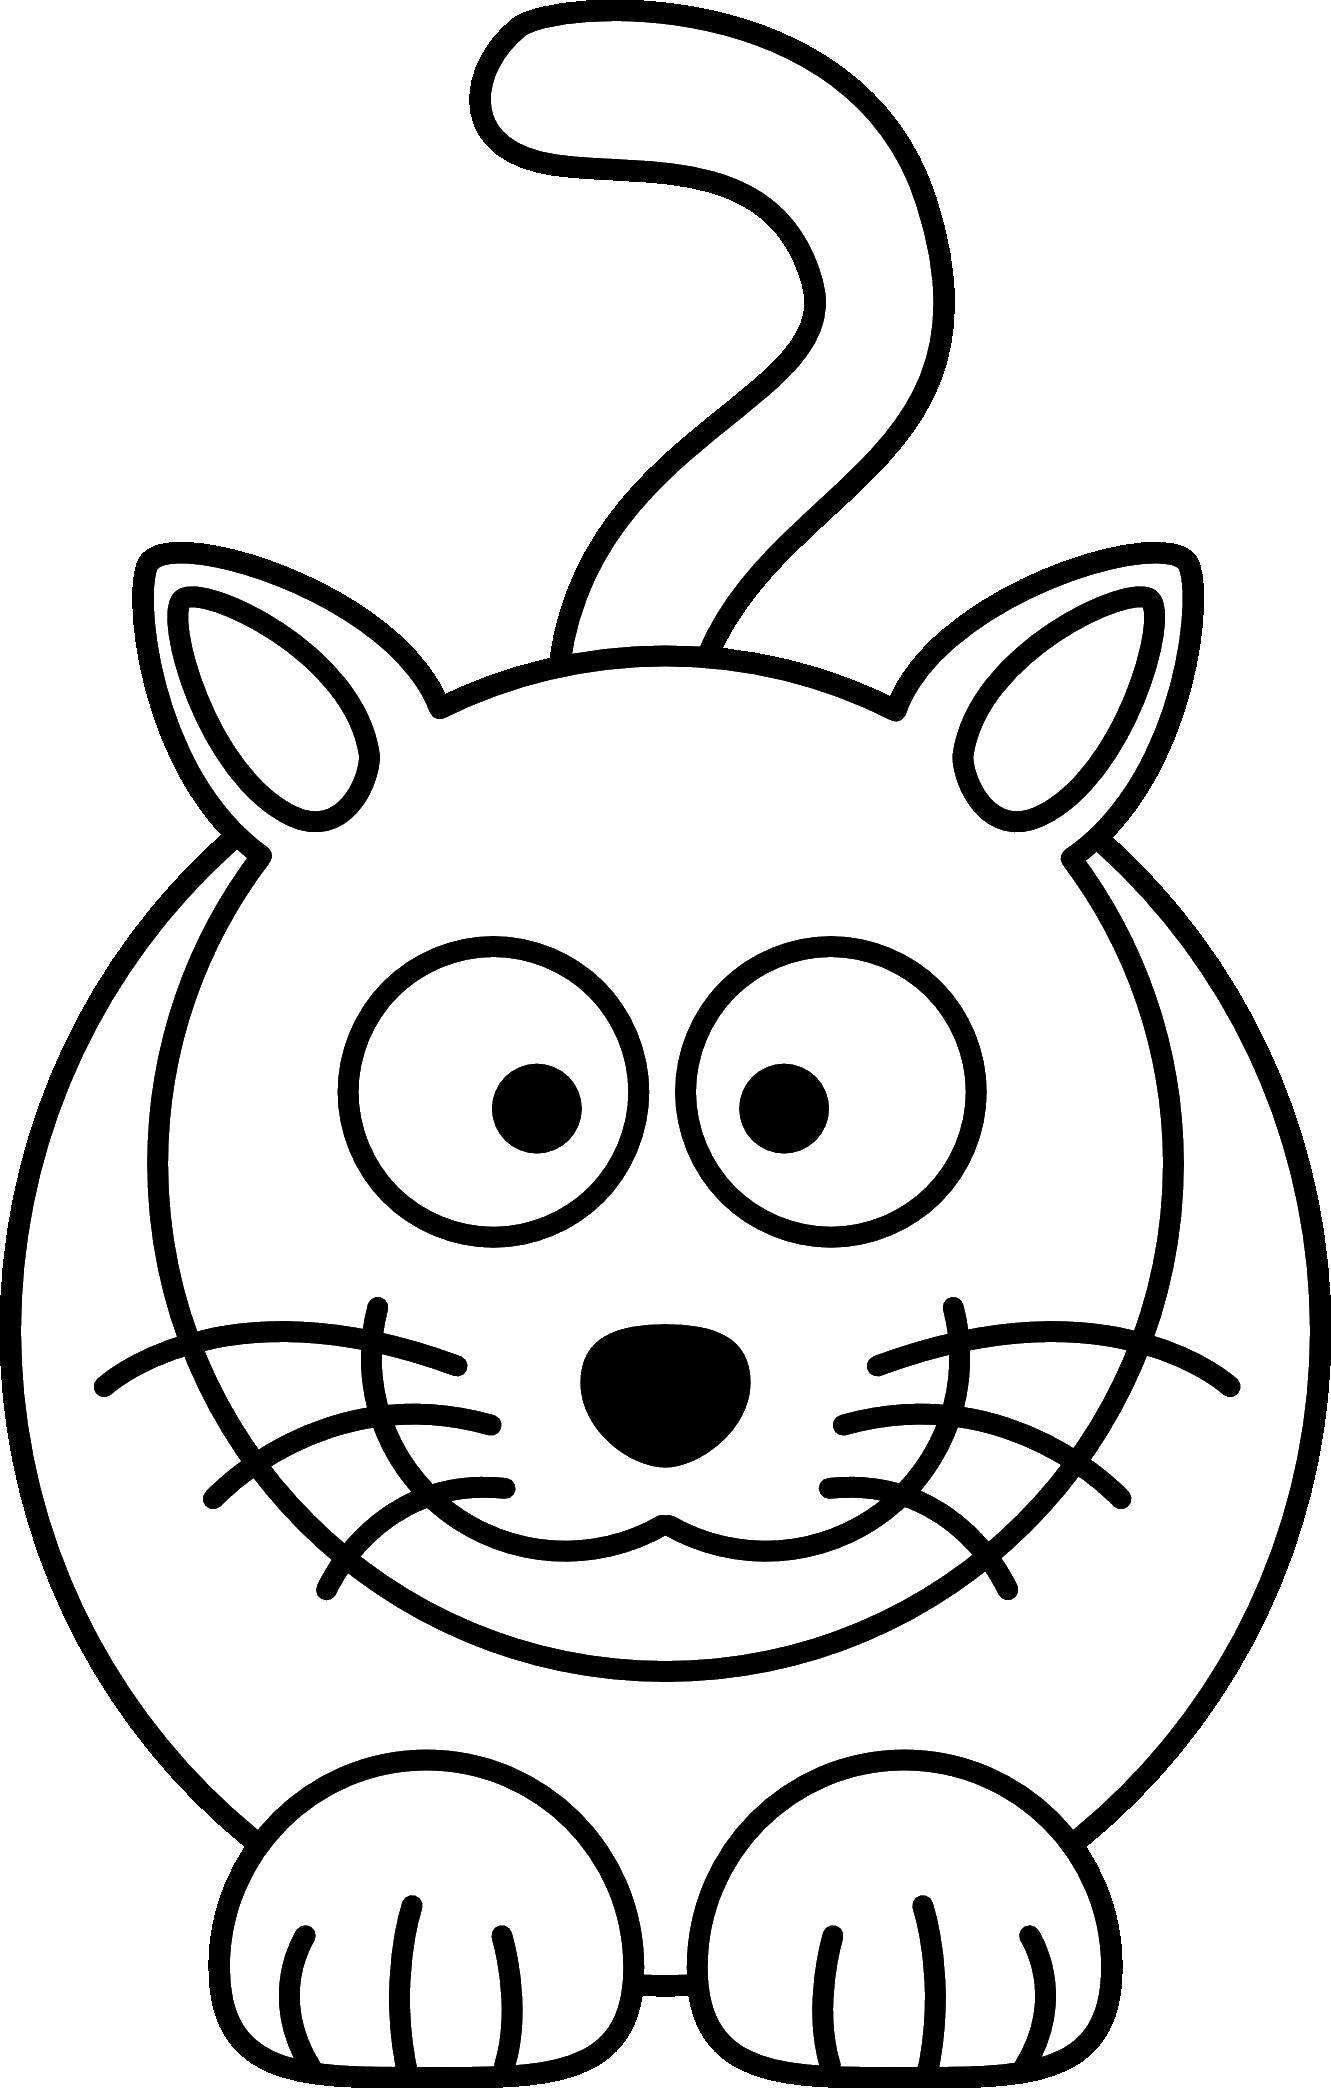 Coloring sheet Cat Download ,professions, waiter,.  Print